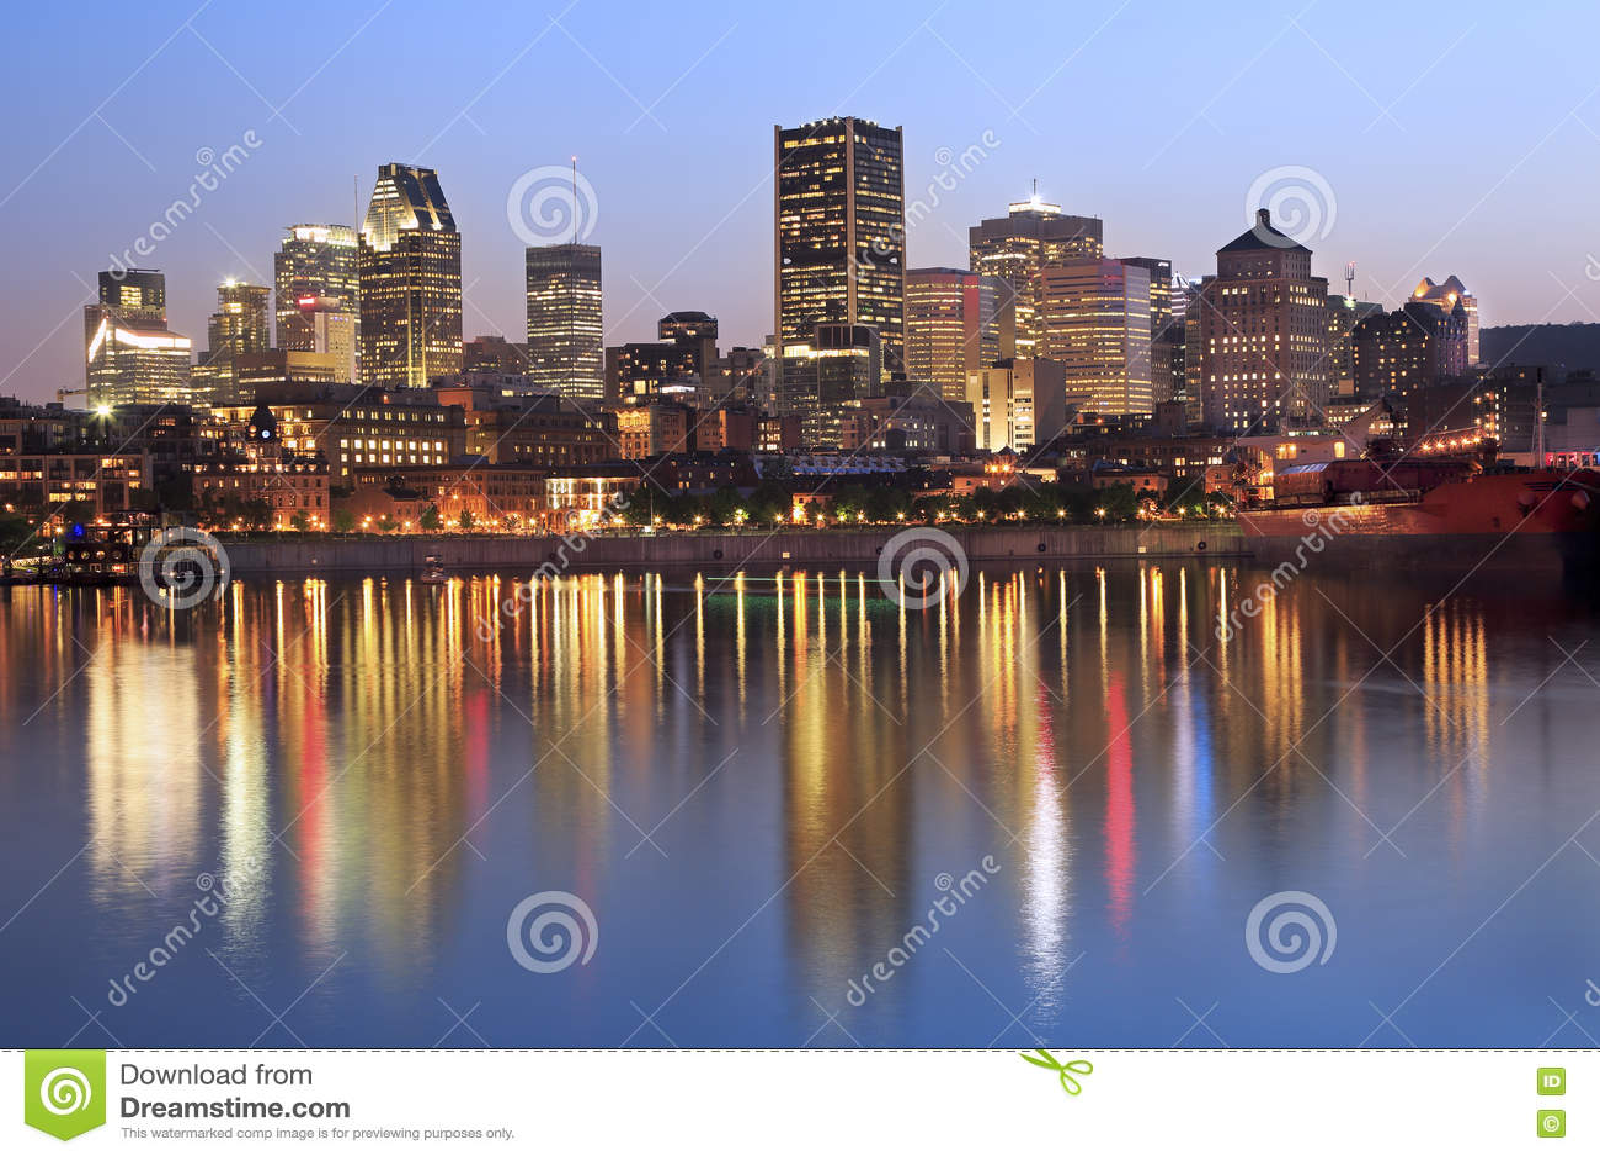 Skyline de Montreal e St Lawrence River no crepúsculo